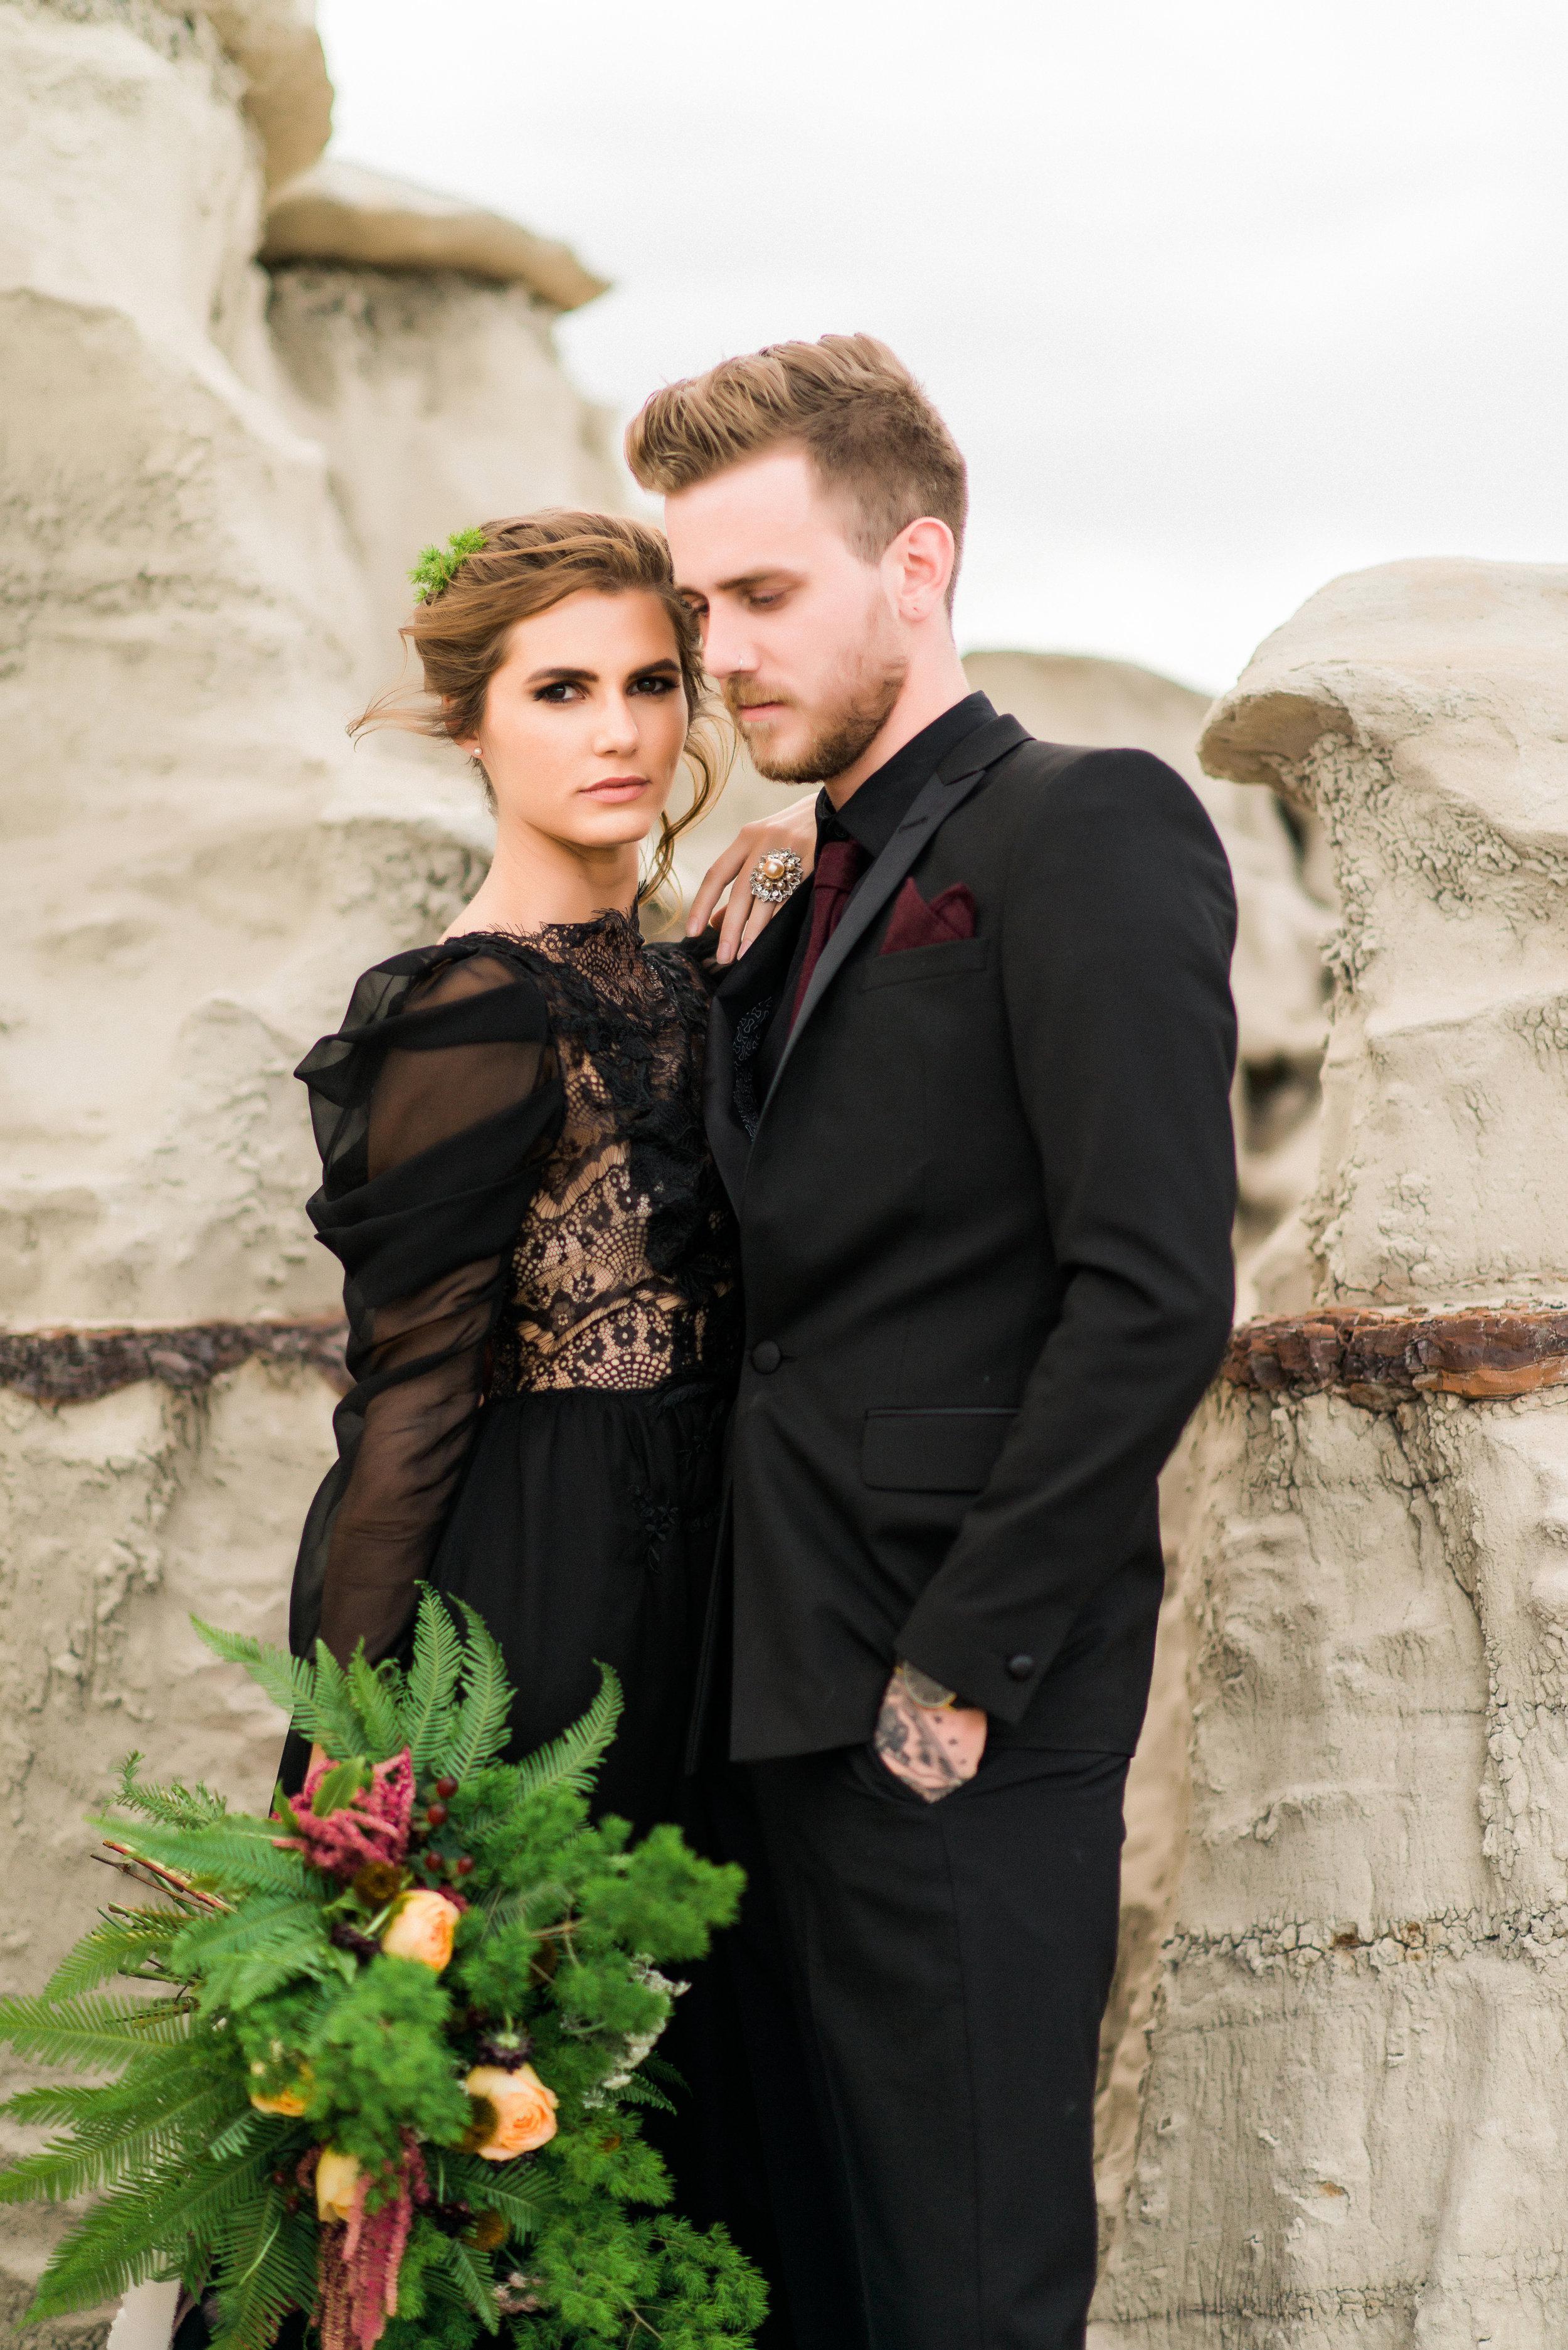 Romantisme Styled shoot  Bisti Badlands, NM